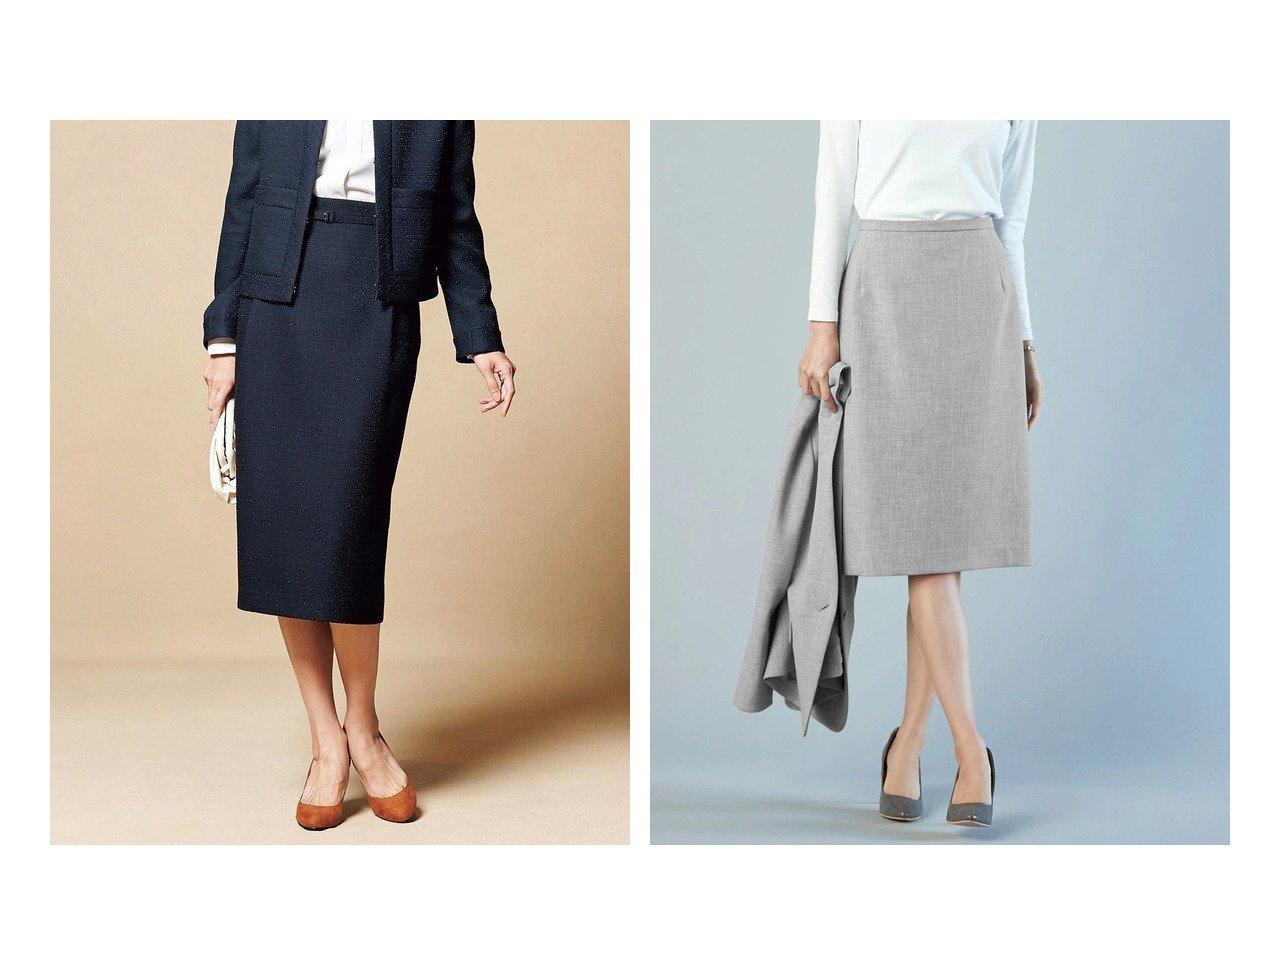 【DoCLASSE/ドゥクラッセ】のななこ織・ミディスカート&プレミアム二重織・ナロースカート ドゥクラッセの40代、50代の方におすすめ!人気トレンド・ファッションの通販 おすすめで人気の流行・トレンド、ファッションの通販商品 メンズファッション・キッズファッション・インテリア・家具・レディースファッション・服の通販 founy(ファニー) https://founy.com/ ファッション Fashion レディースファッション WOMEN スカート Skirt ツイード プリント リアル なめらか オケージョン シンプル ストレッチ フォルム プレミアム |ID:crp329100000021643